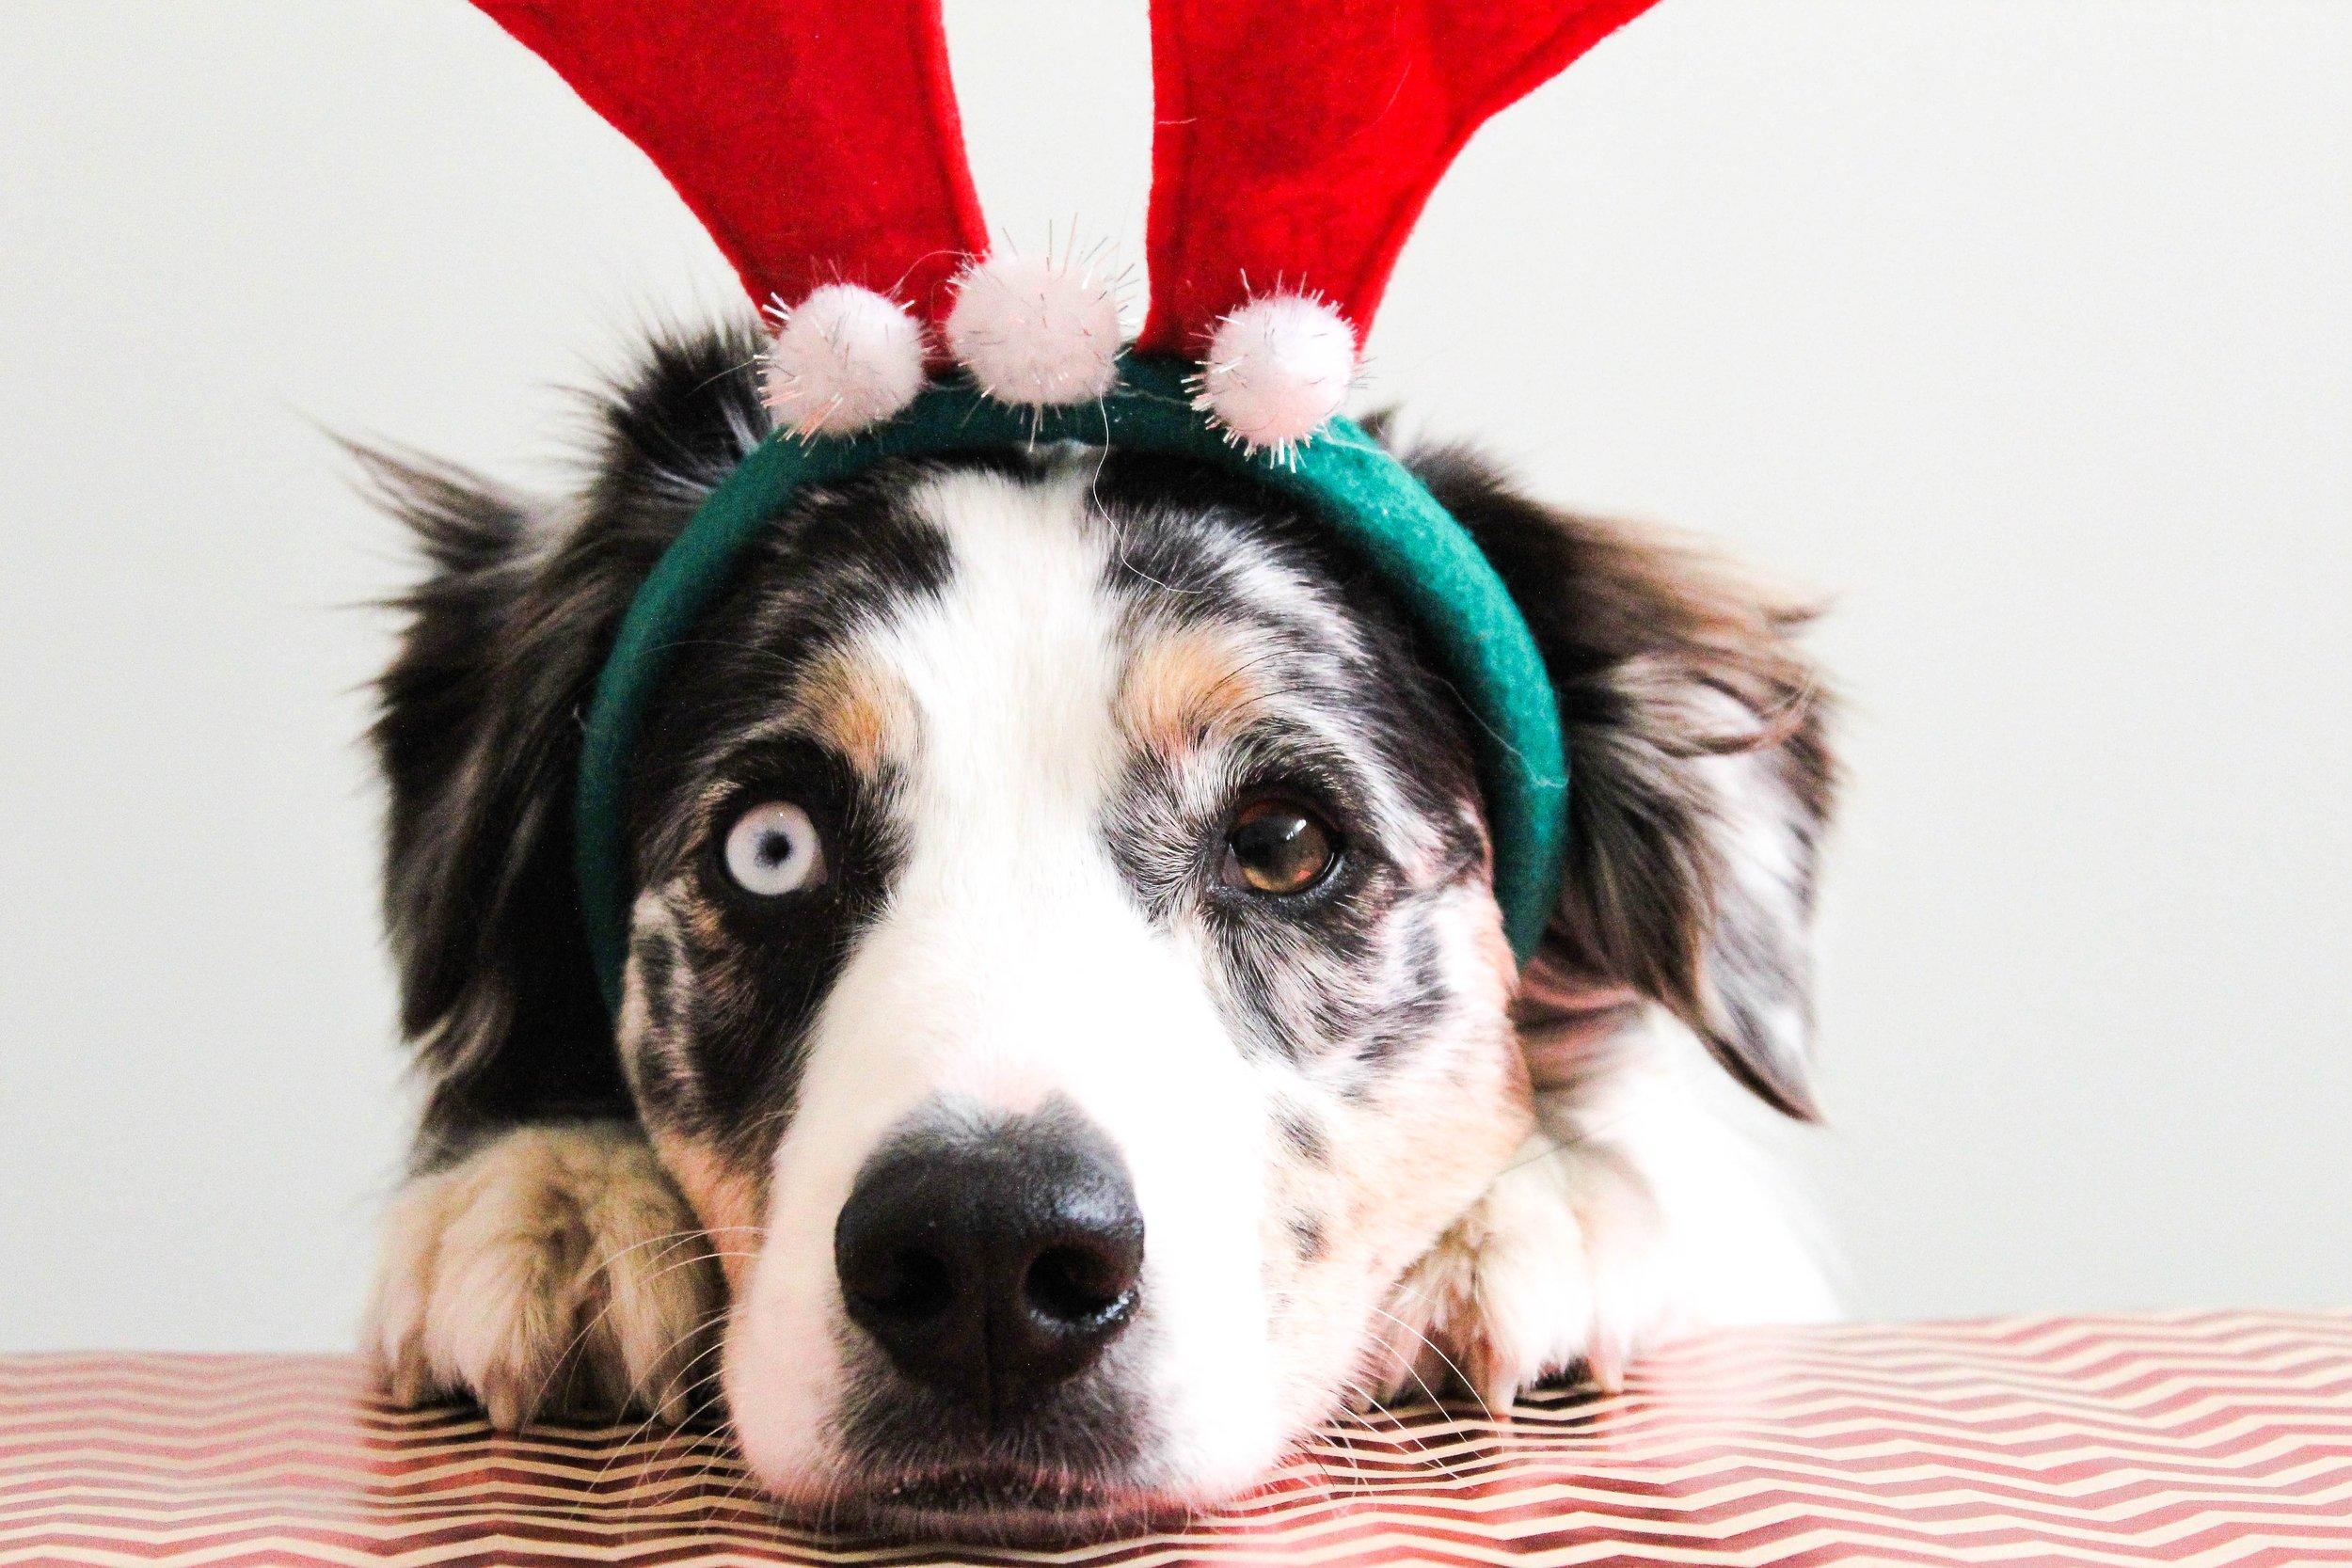 winter-white-sweet-puppy-dog-animal-1168545-pxhere.com.jpg